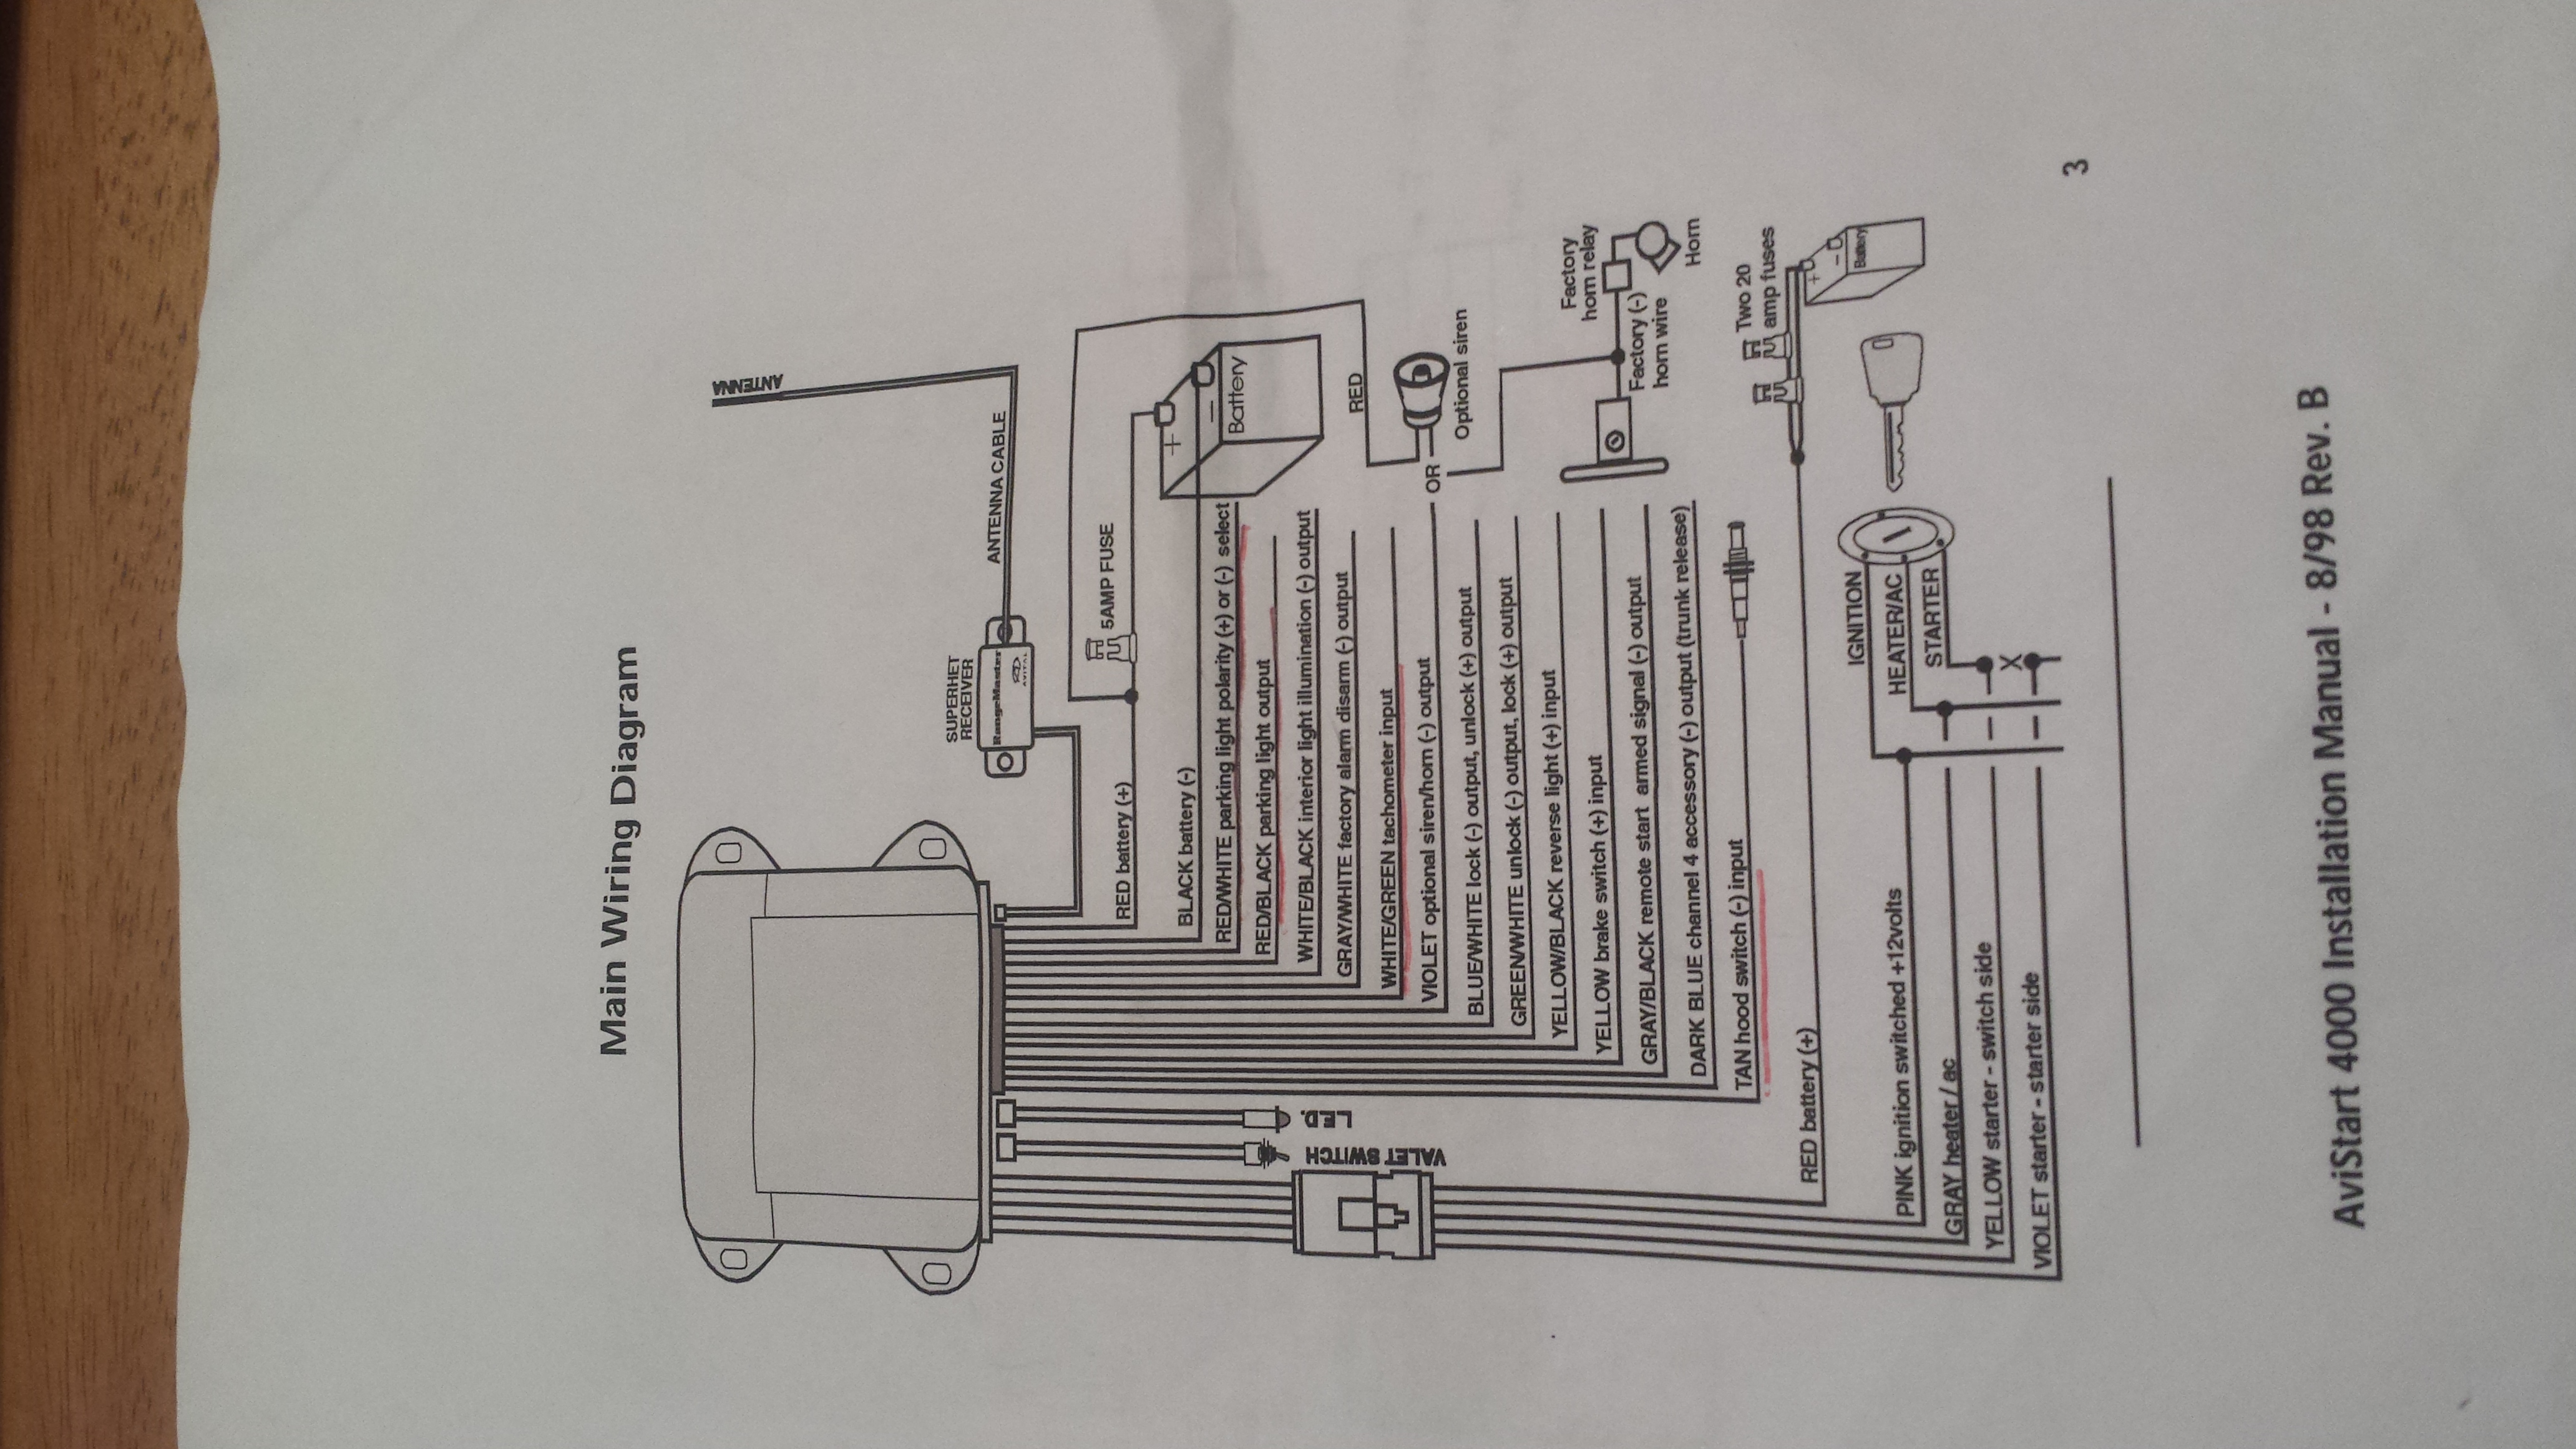 [DIAGRAM_5NL]  YT_8647] Viper 300 Wiring Diagram Wiring Diagram | Viper 5101 Wiring Diagram |  | Inrebe Trua Garna Tixat Mohammedshrine Librar Wiring 101